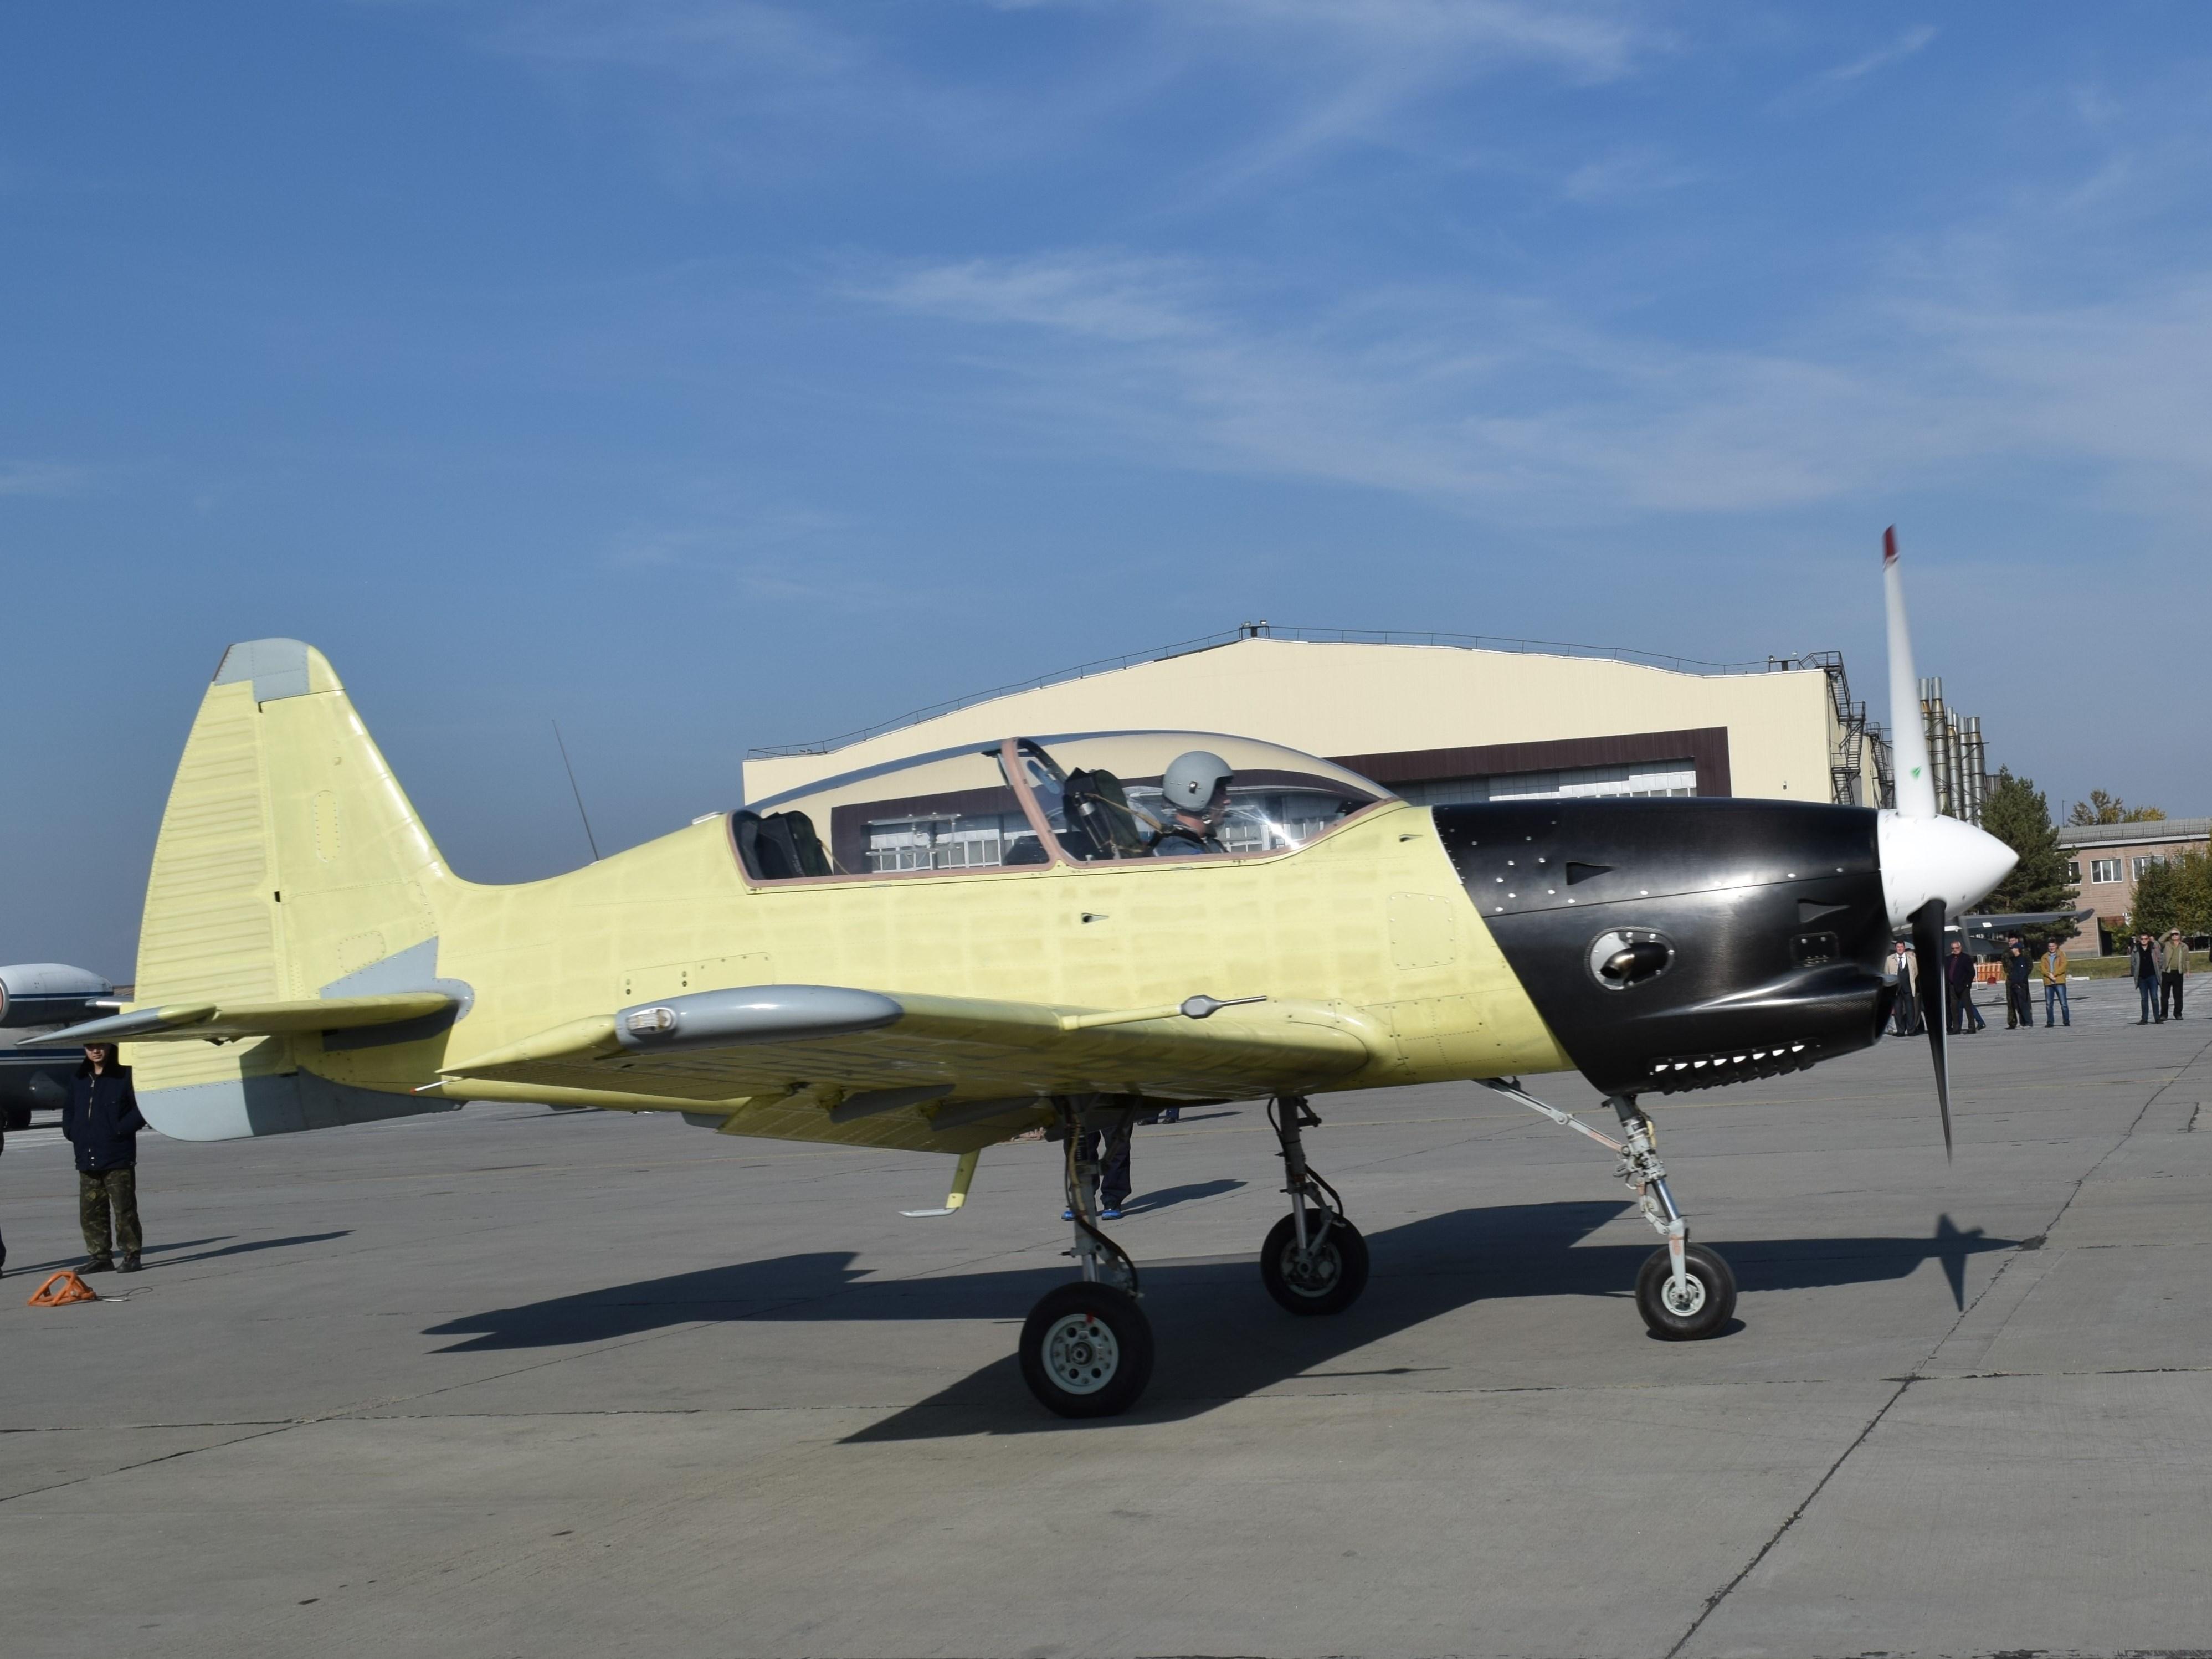 Yak-152 Trainer Aircraft  - Page 2 3664269_original